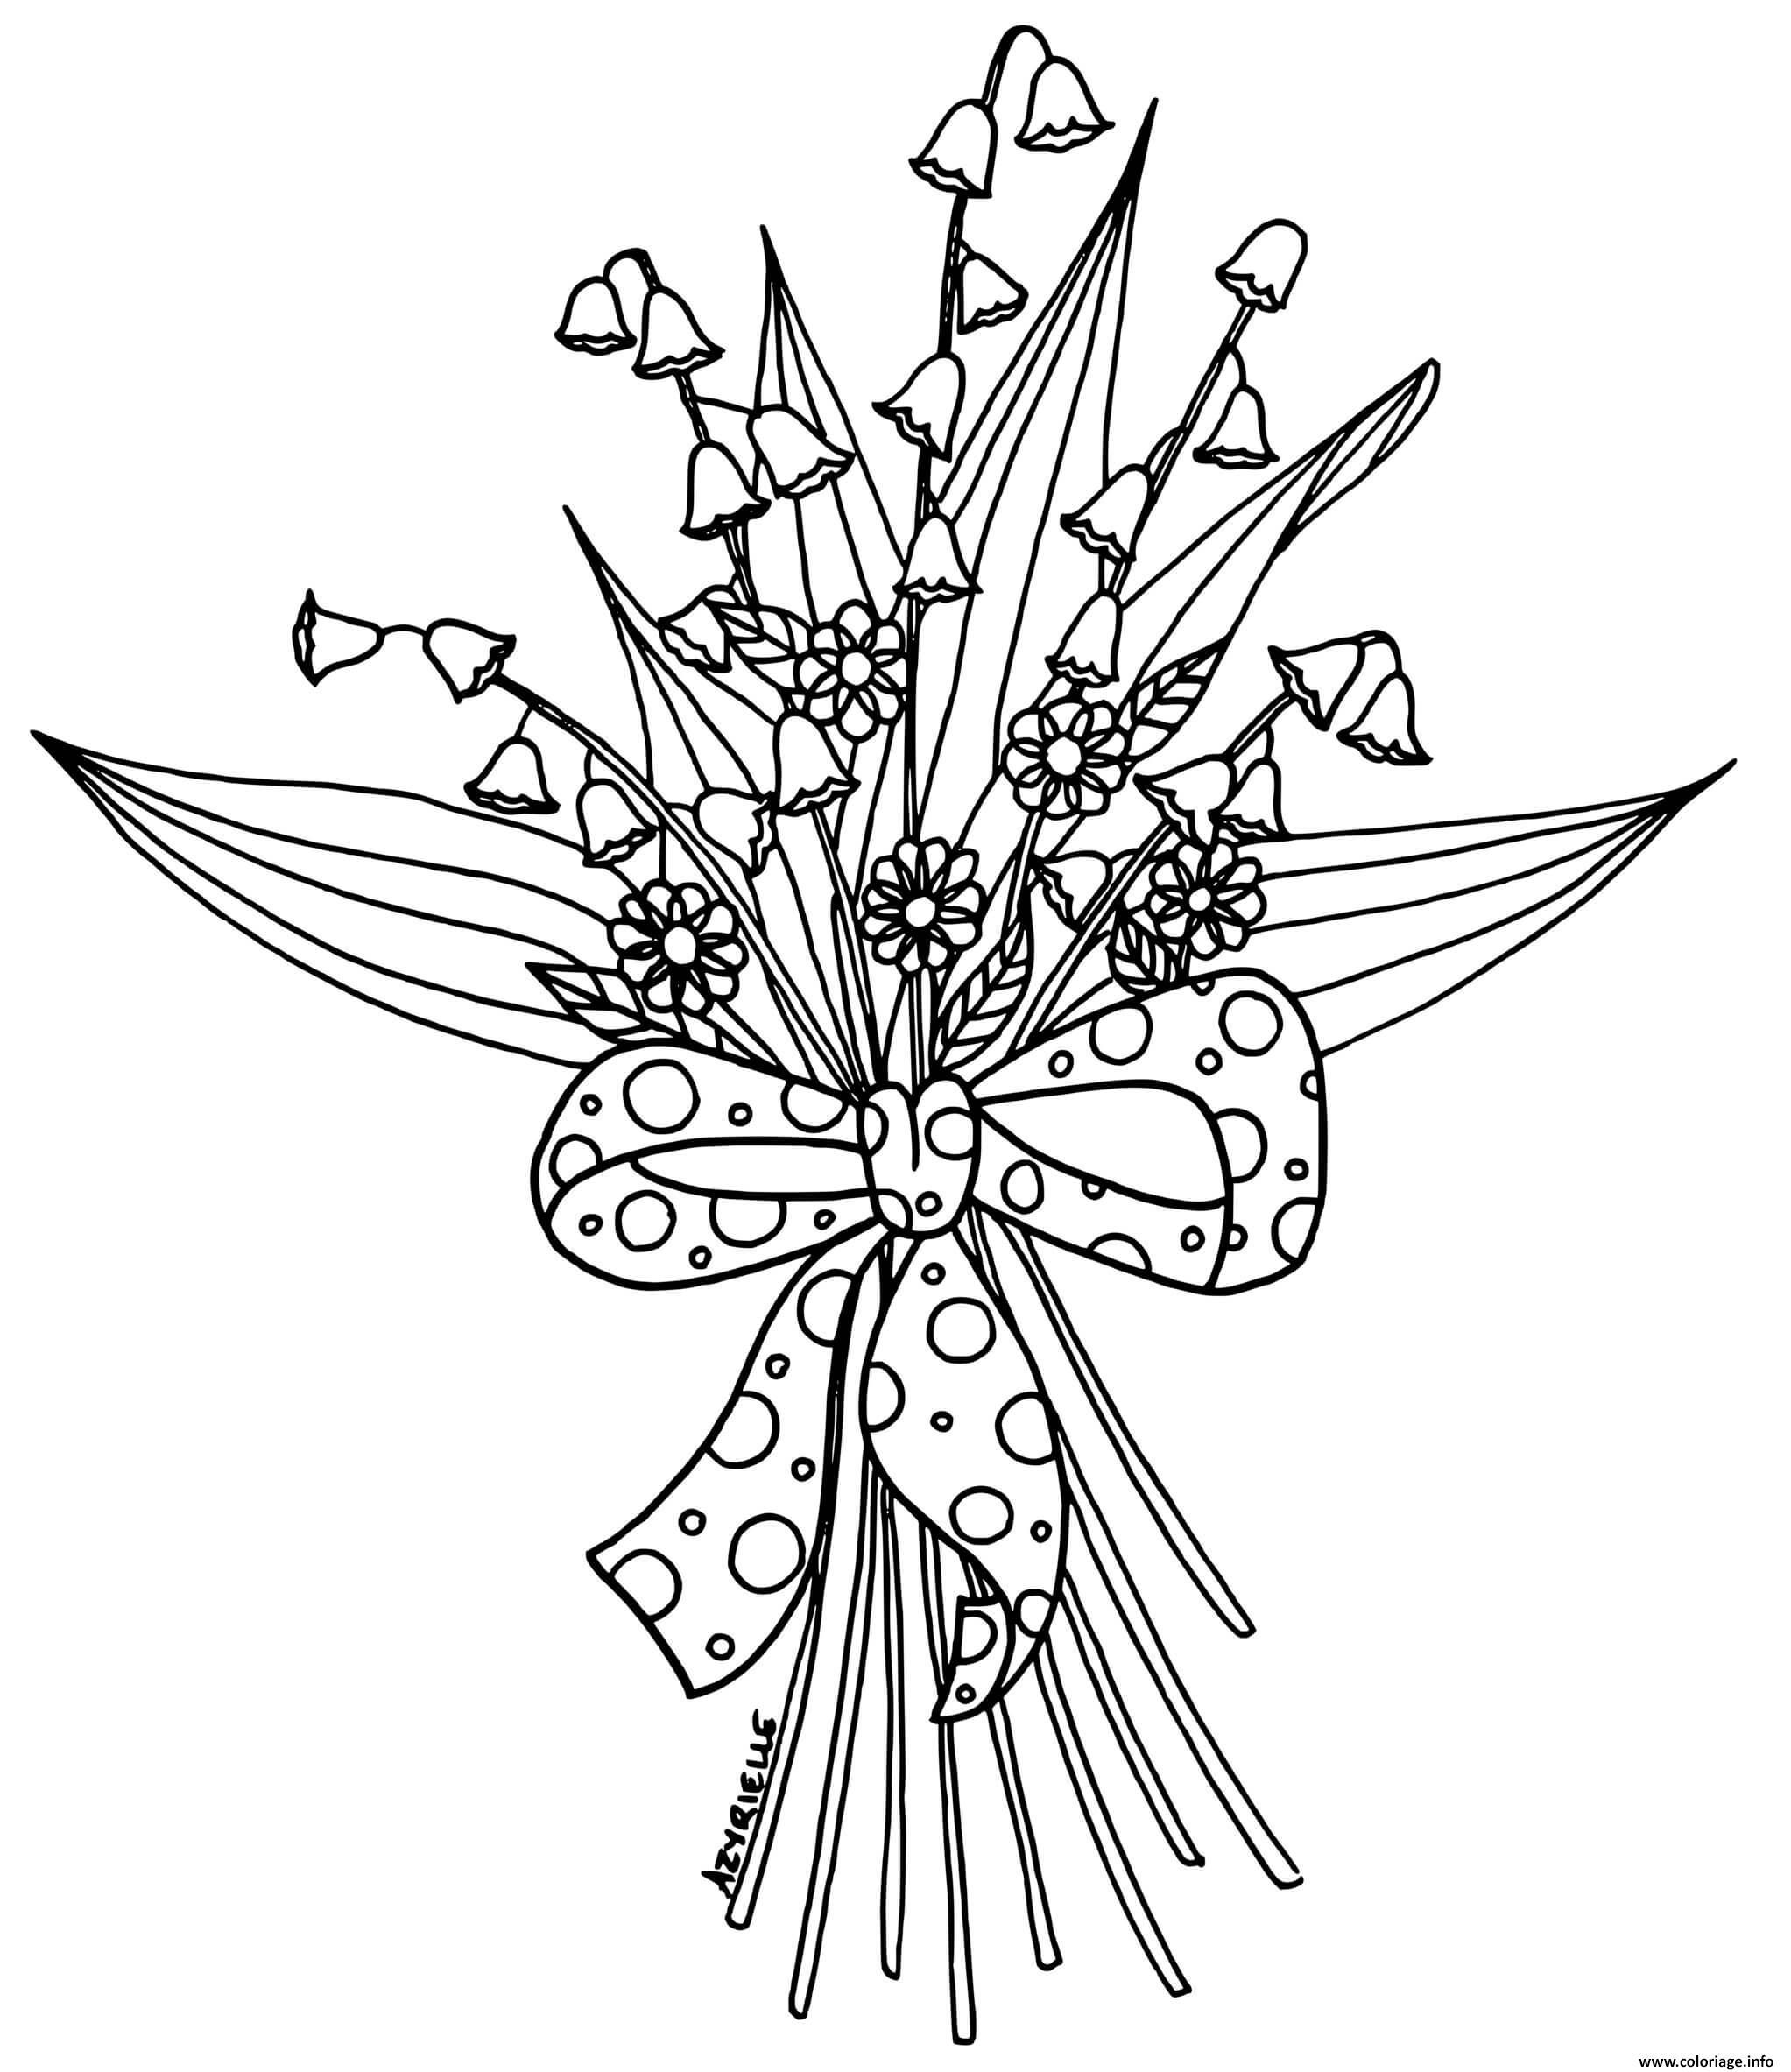 Dessin fleurs de muguet brin 1er mai Coloriage Gratuit à Imprimer